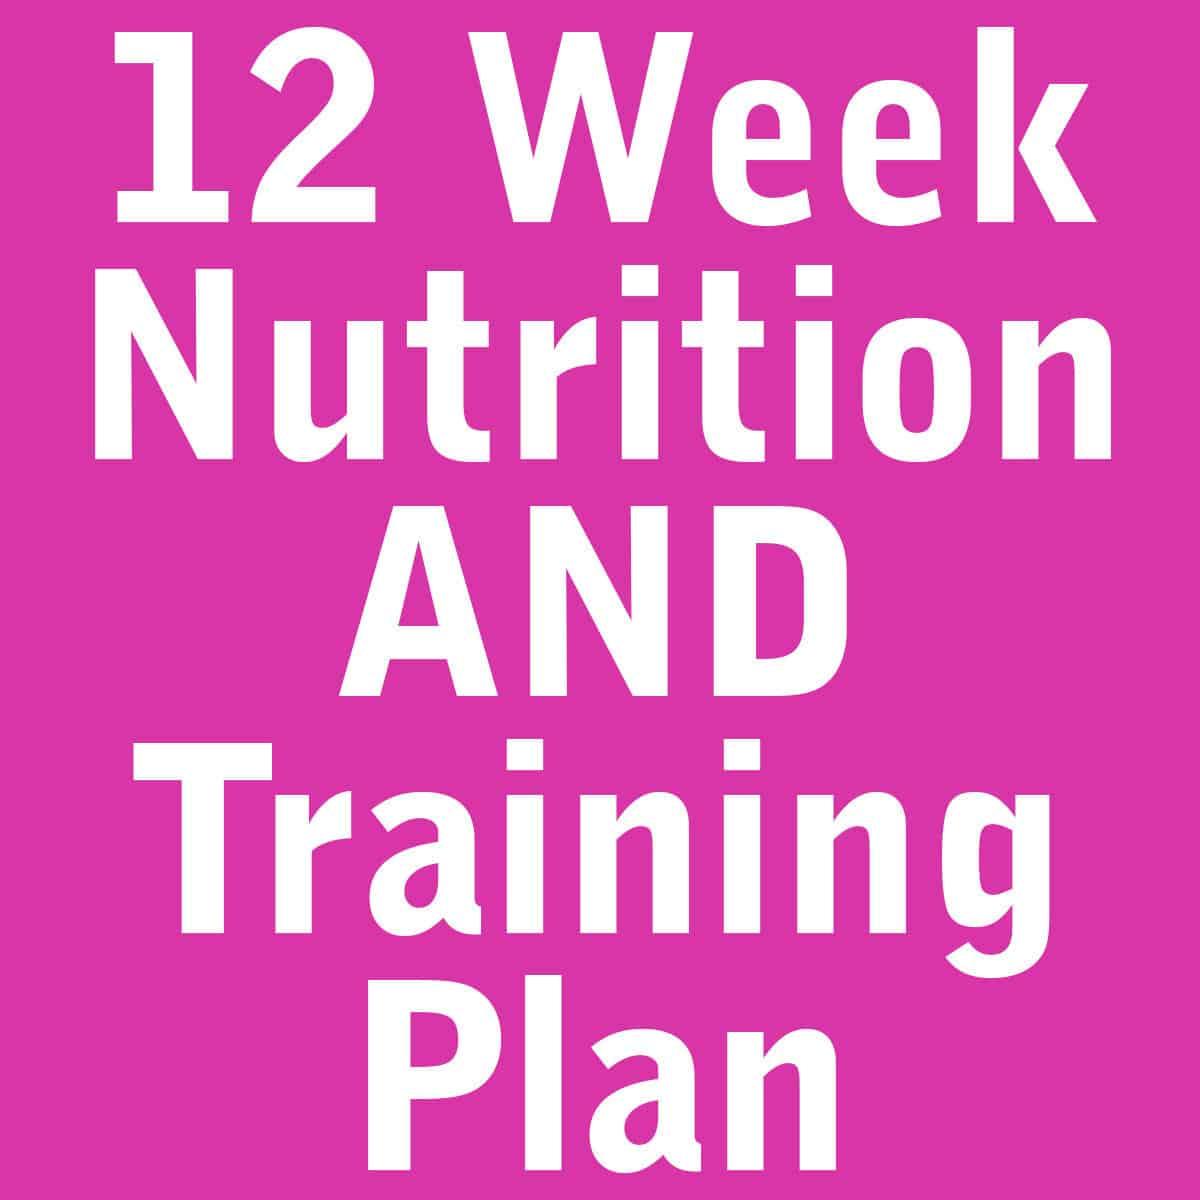 12 week nutrition plan pdf